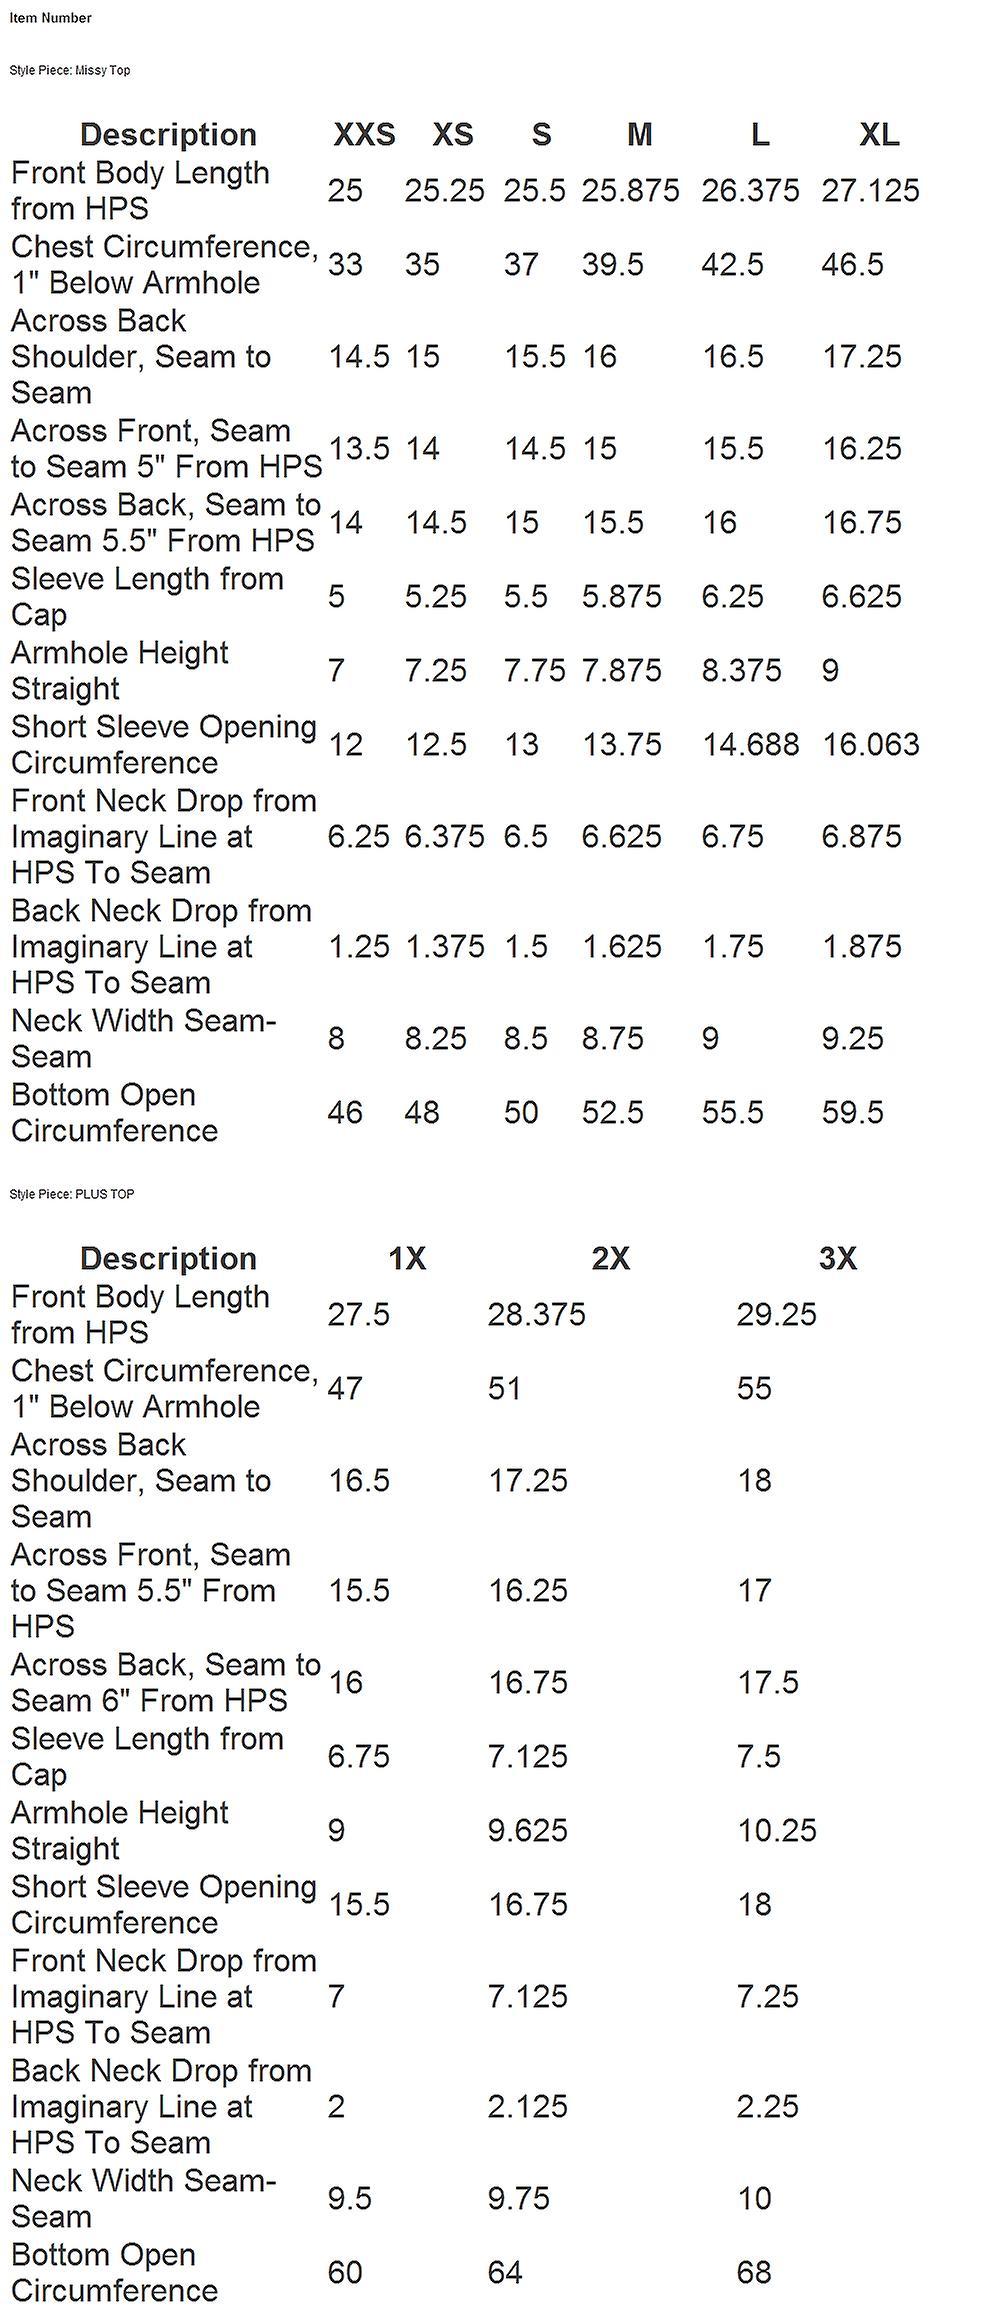 H by Halston Women's Top Essentials V-Neck w/ Forward Seam Purple A306231